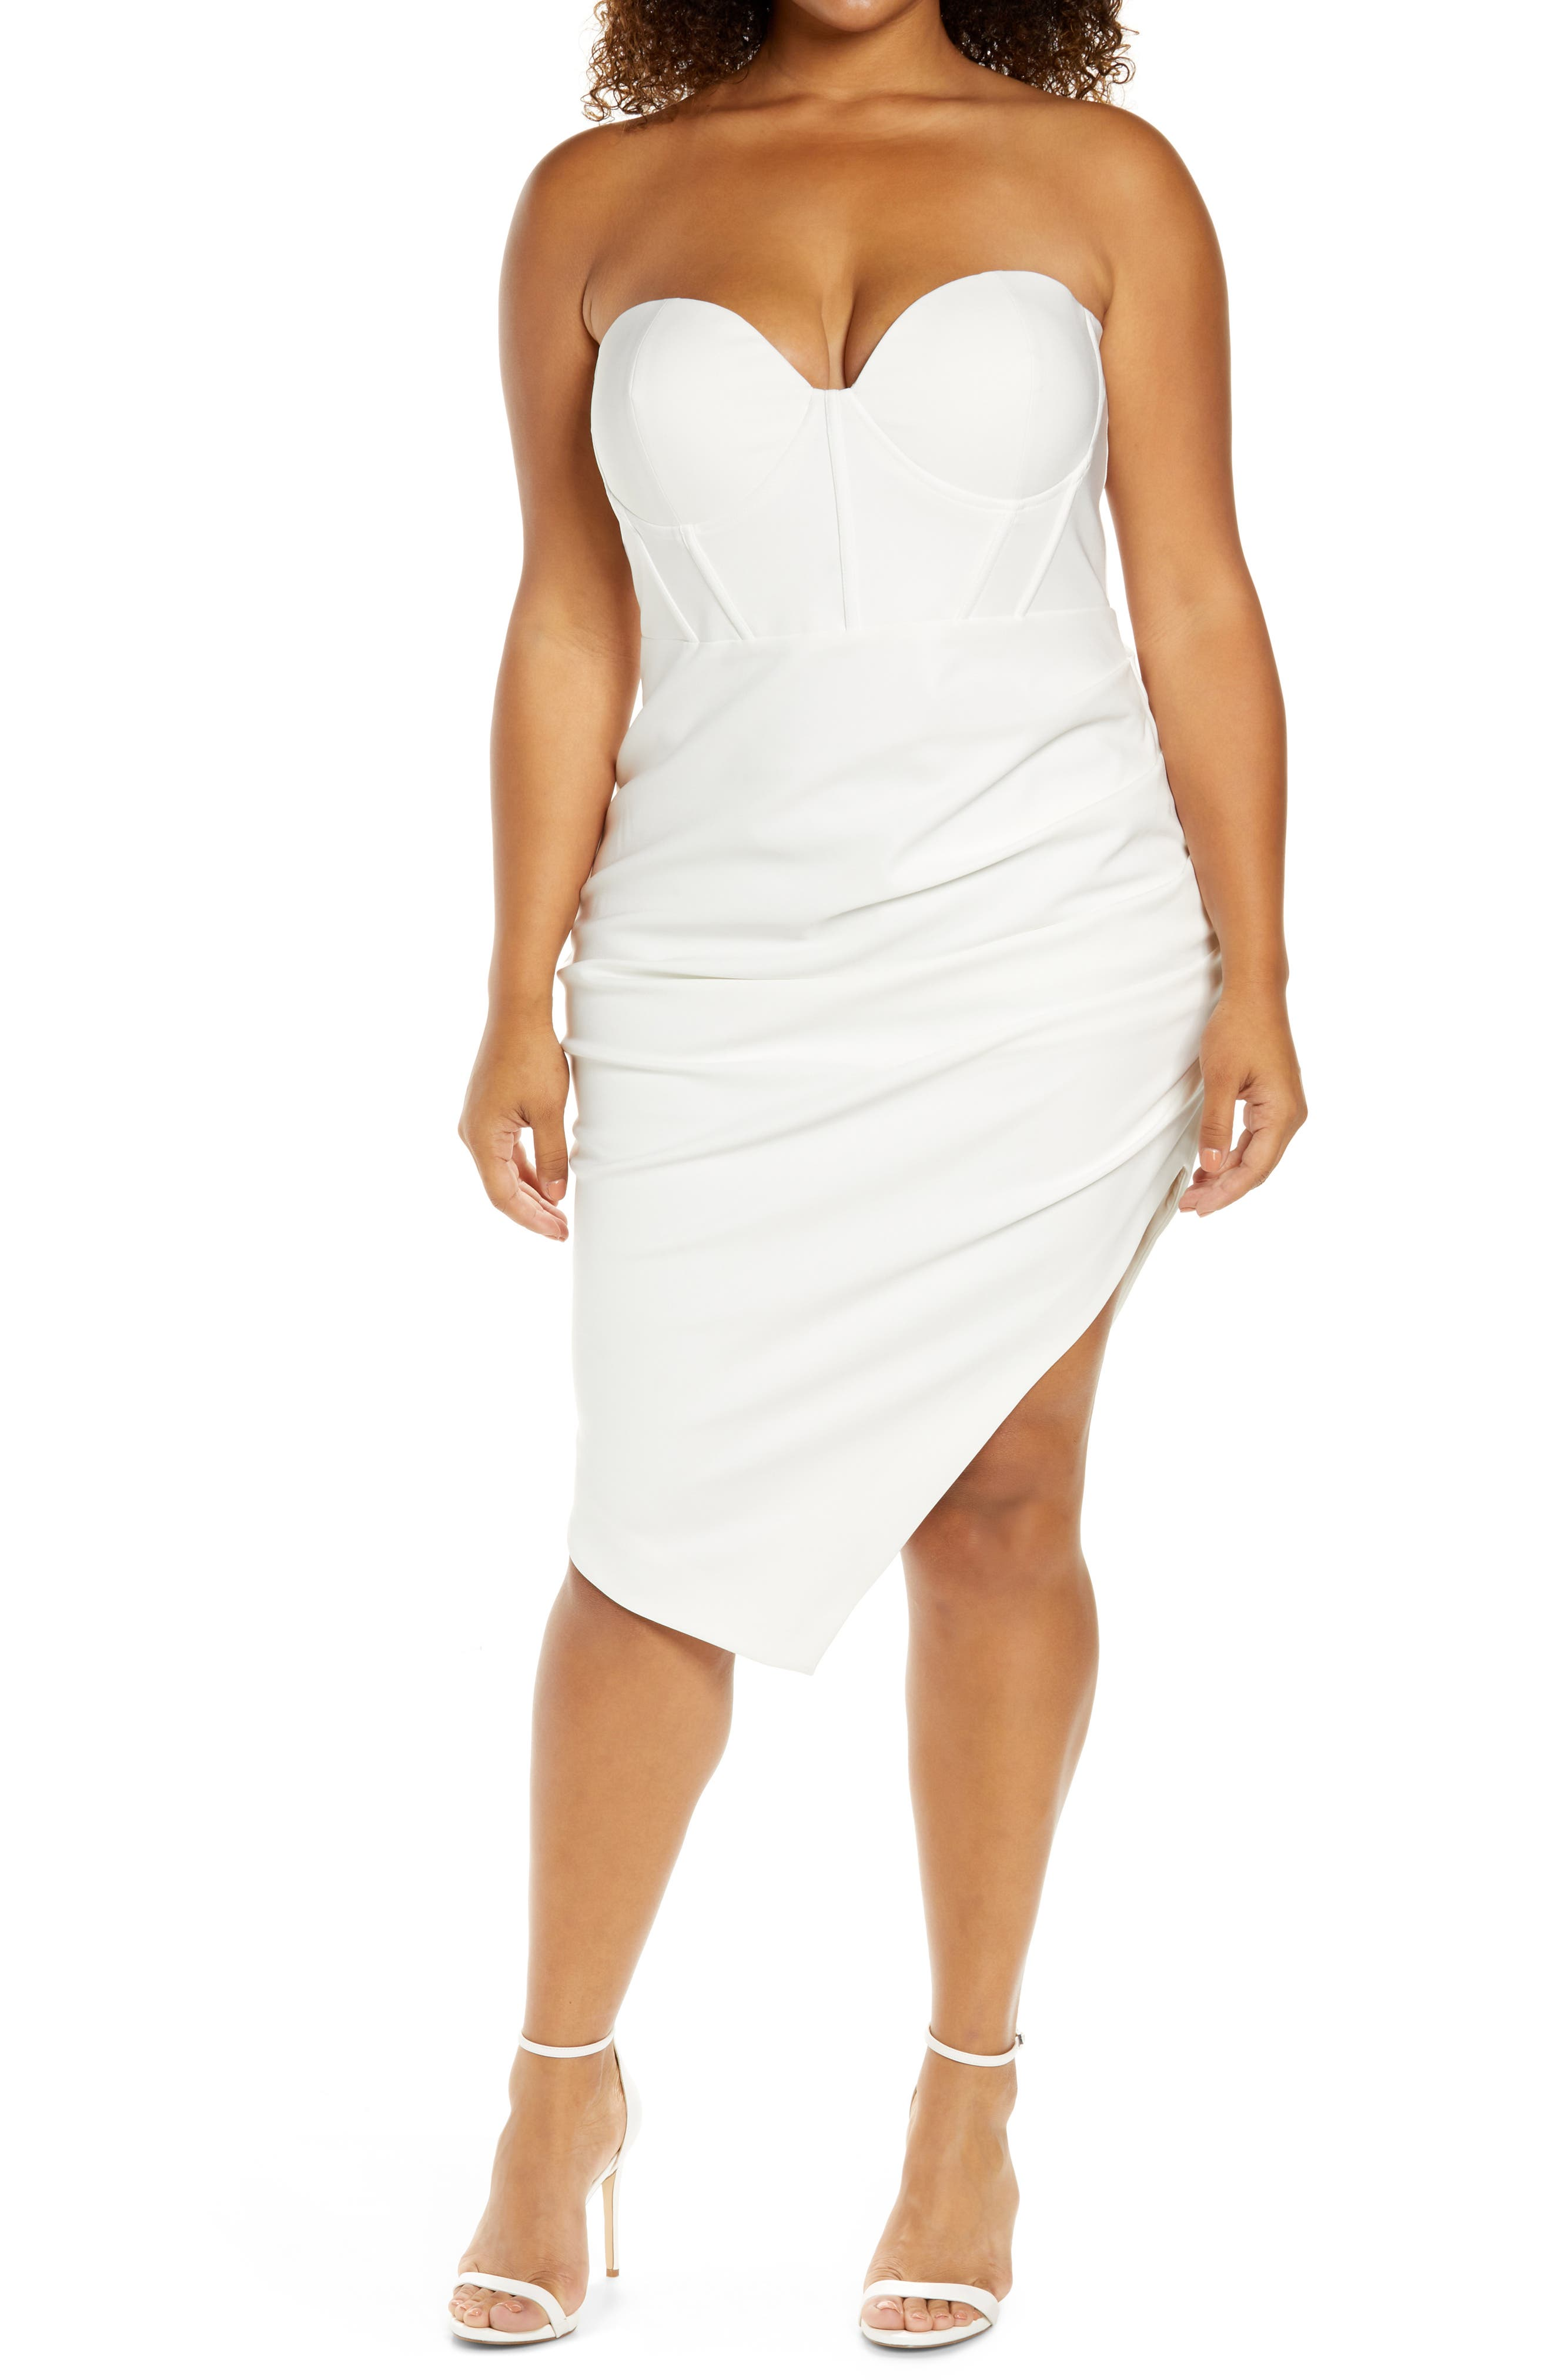 Bustier Corset Cocktail Dress